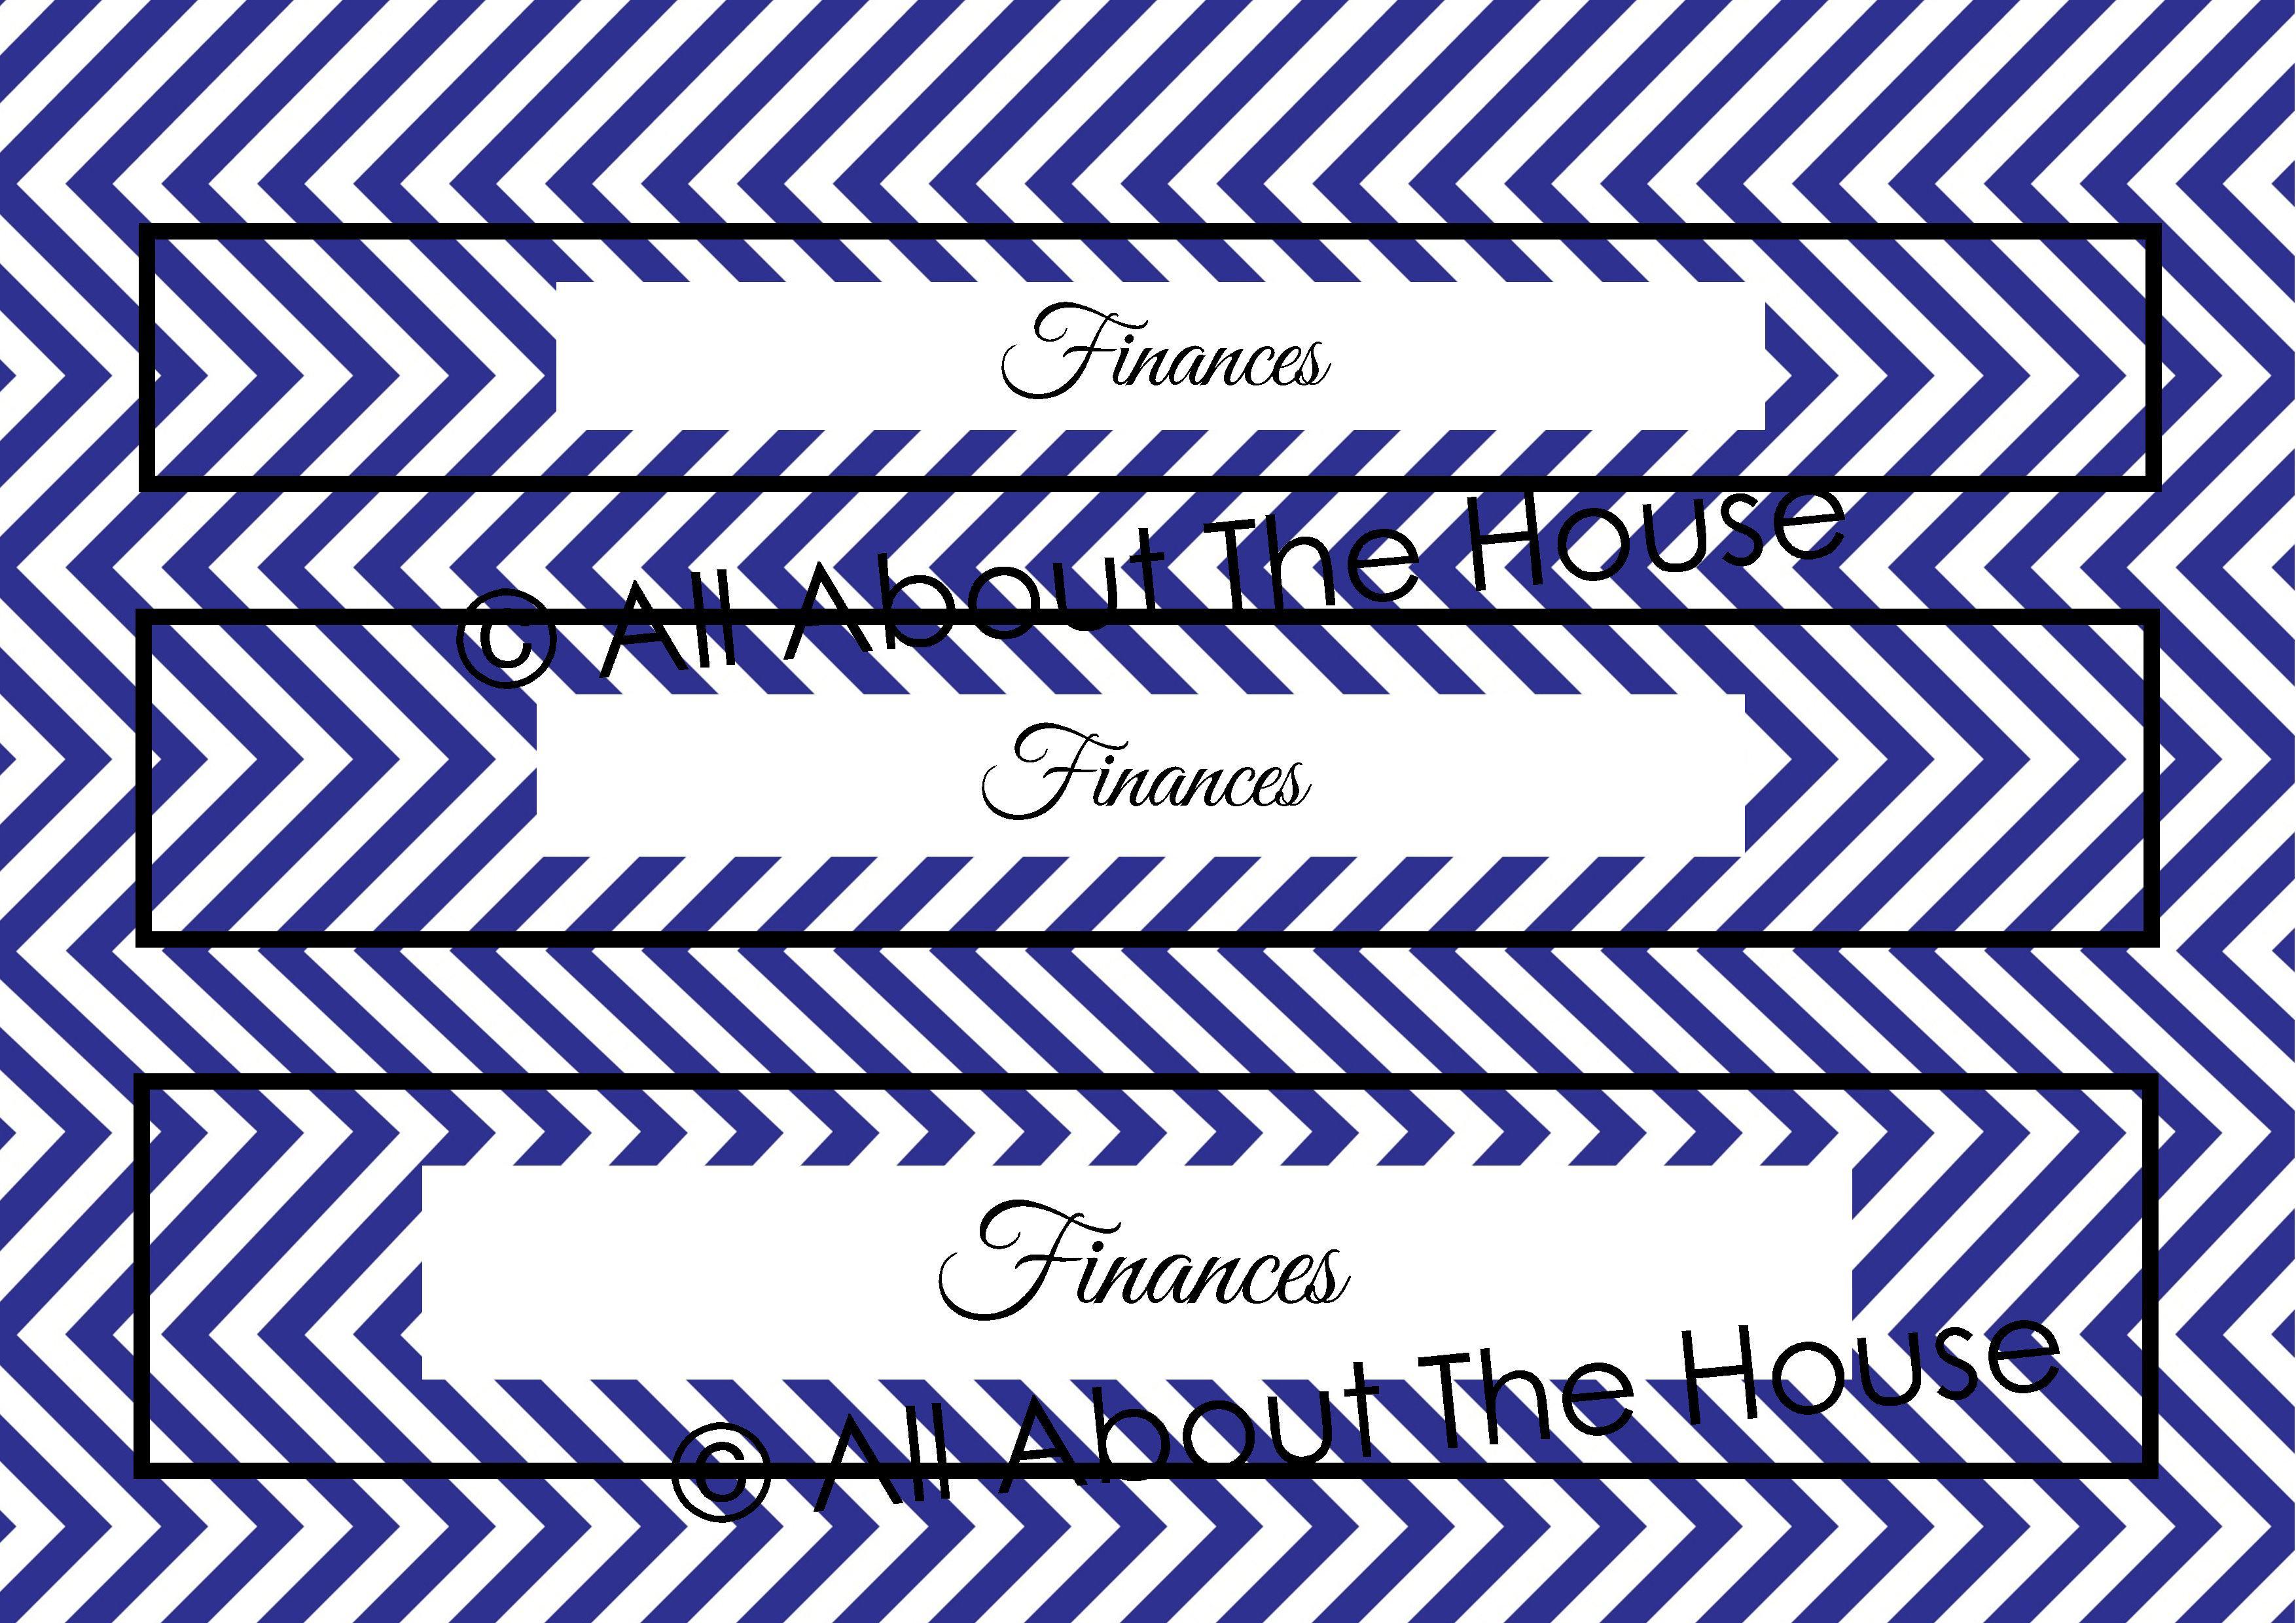 017 Binder Spine Labels Resume Free Download Label Template Monpence - Printable Binder Spine Inserts Free